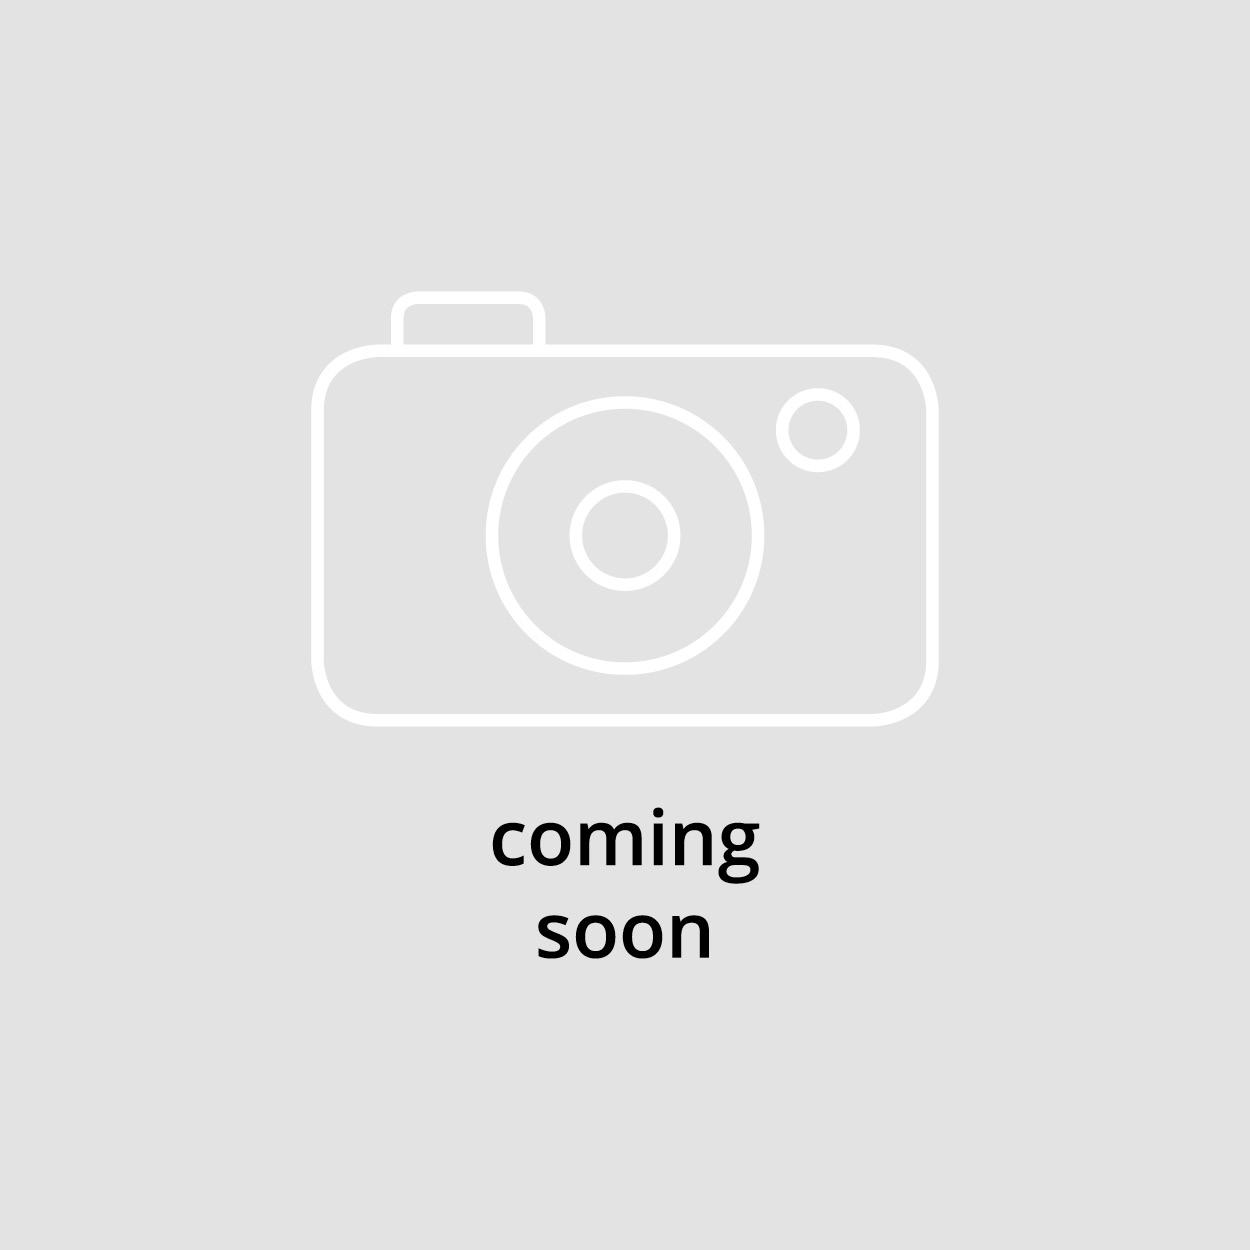 15.01.604 Distanziale per tirante spingibarra variante 25mm Gildemeister AS20, GS20, GM20, GM20AC